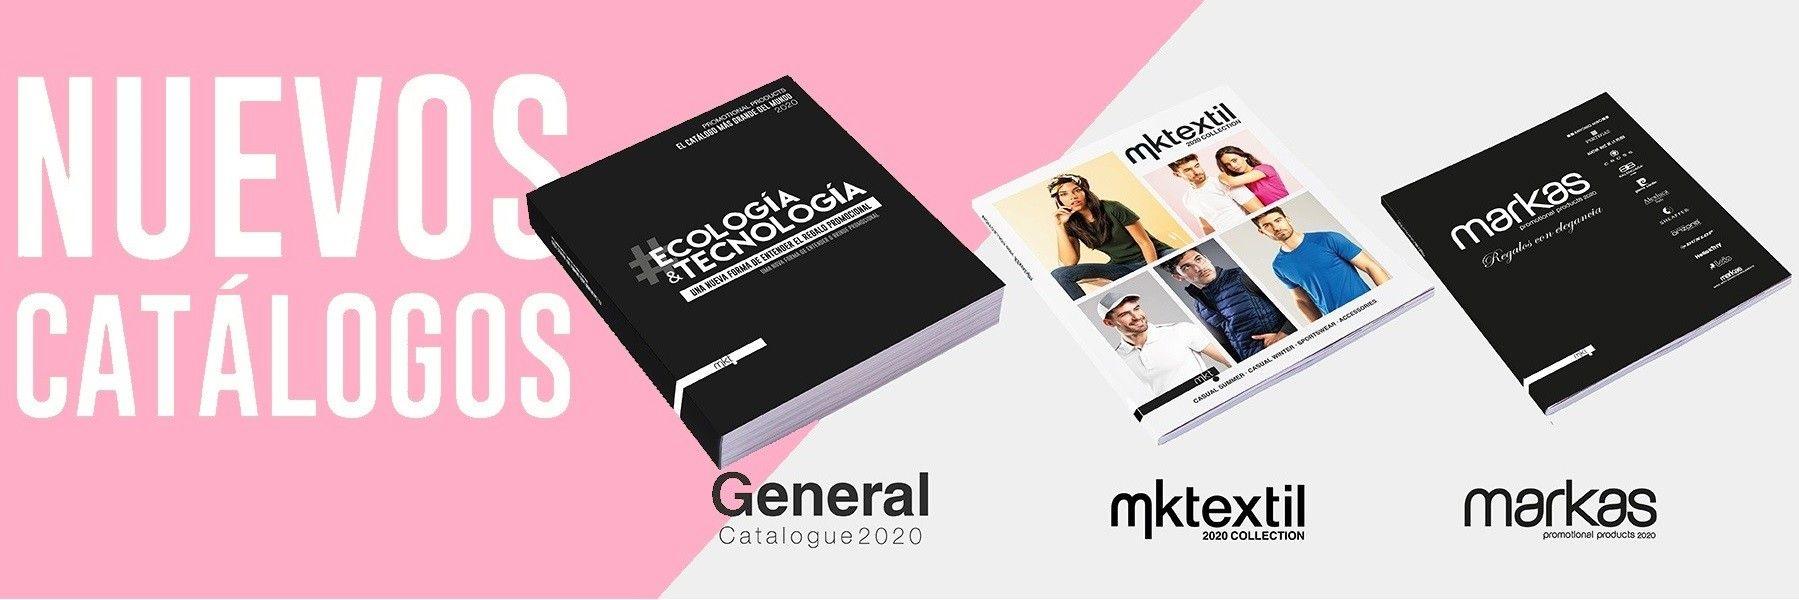 Catálogos 2020